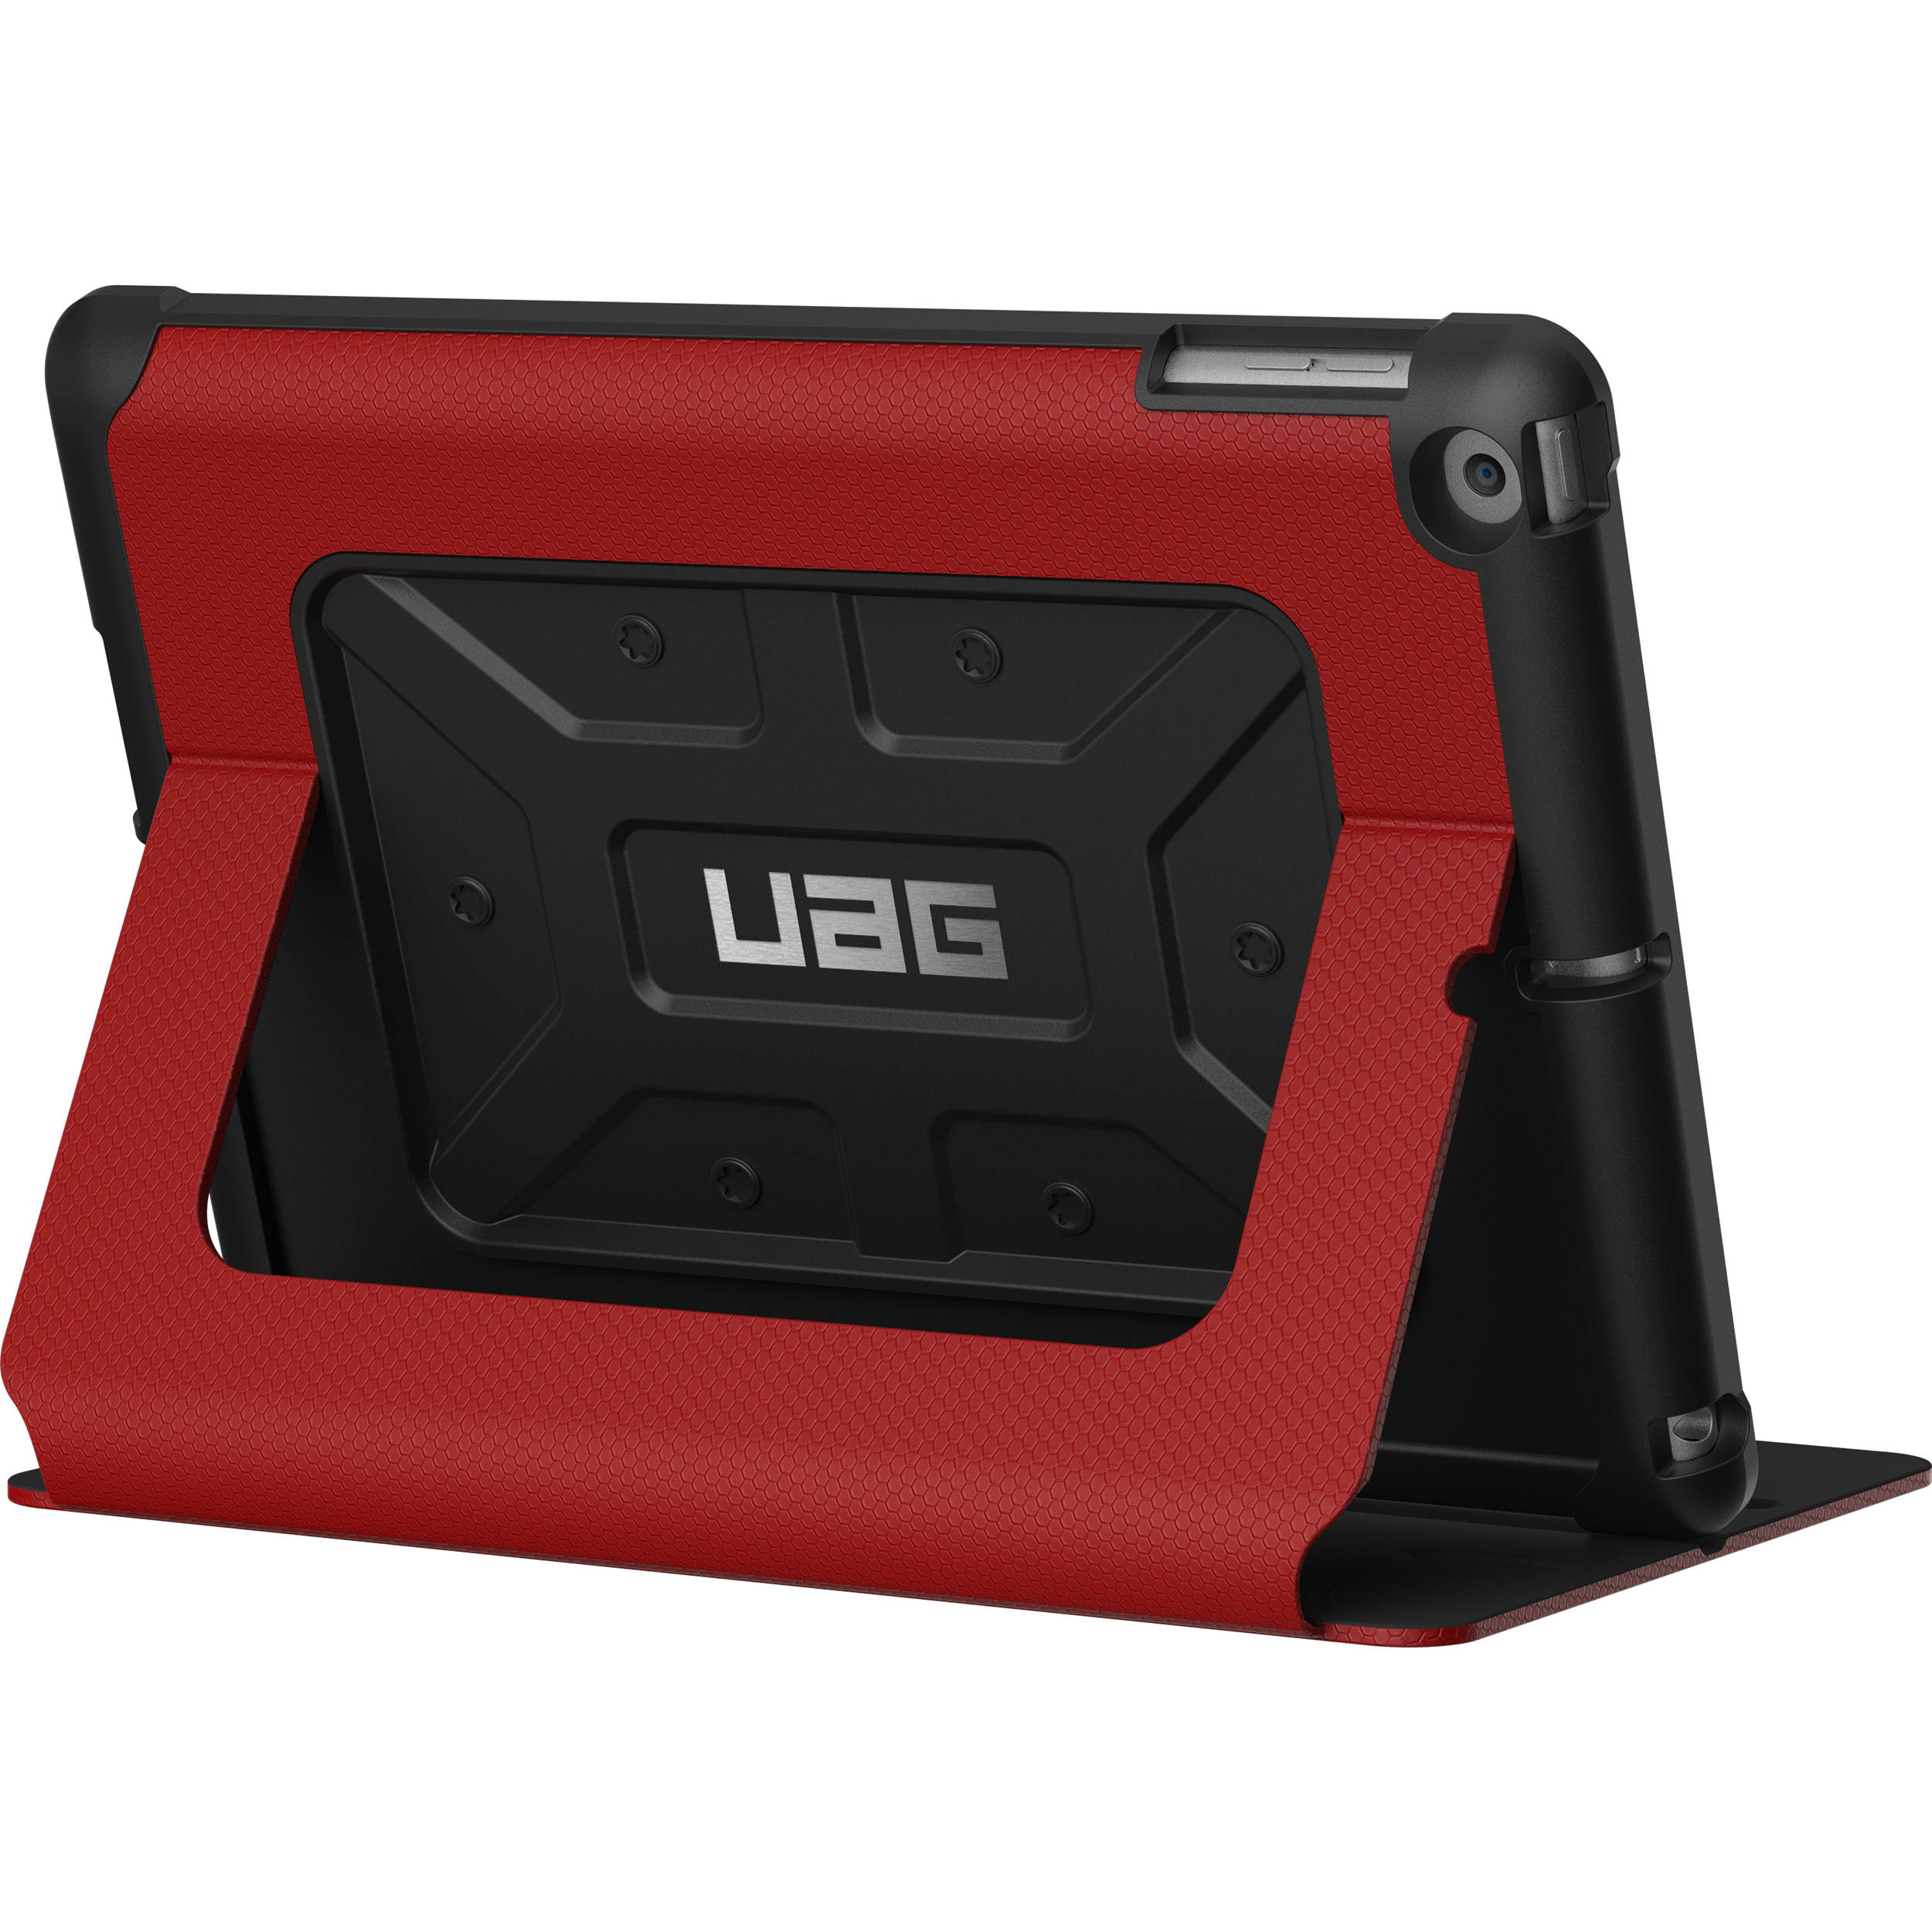 online store 3b05c 1c2e6 Urban Armor Gear Case for iPad 9.7